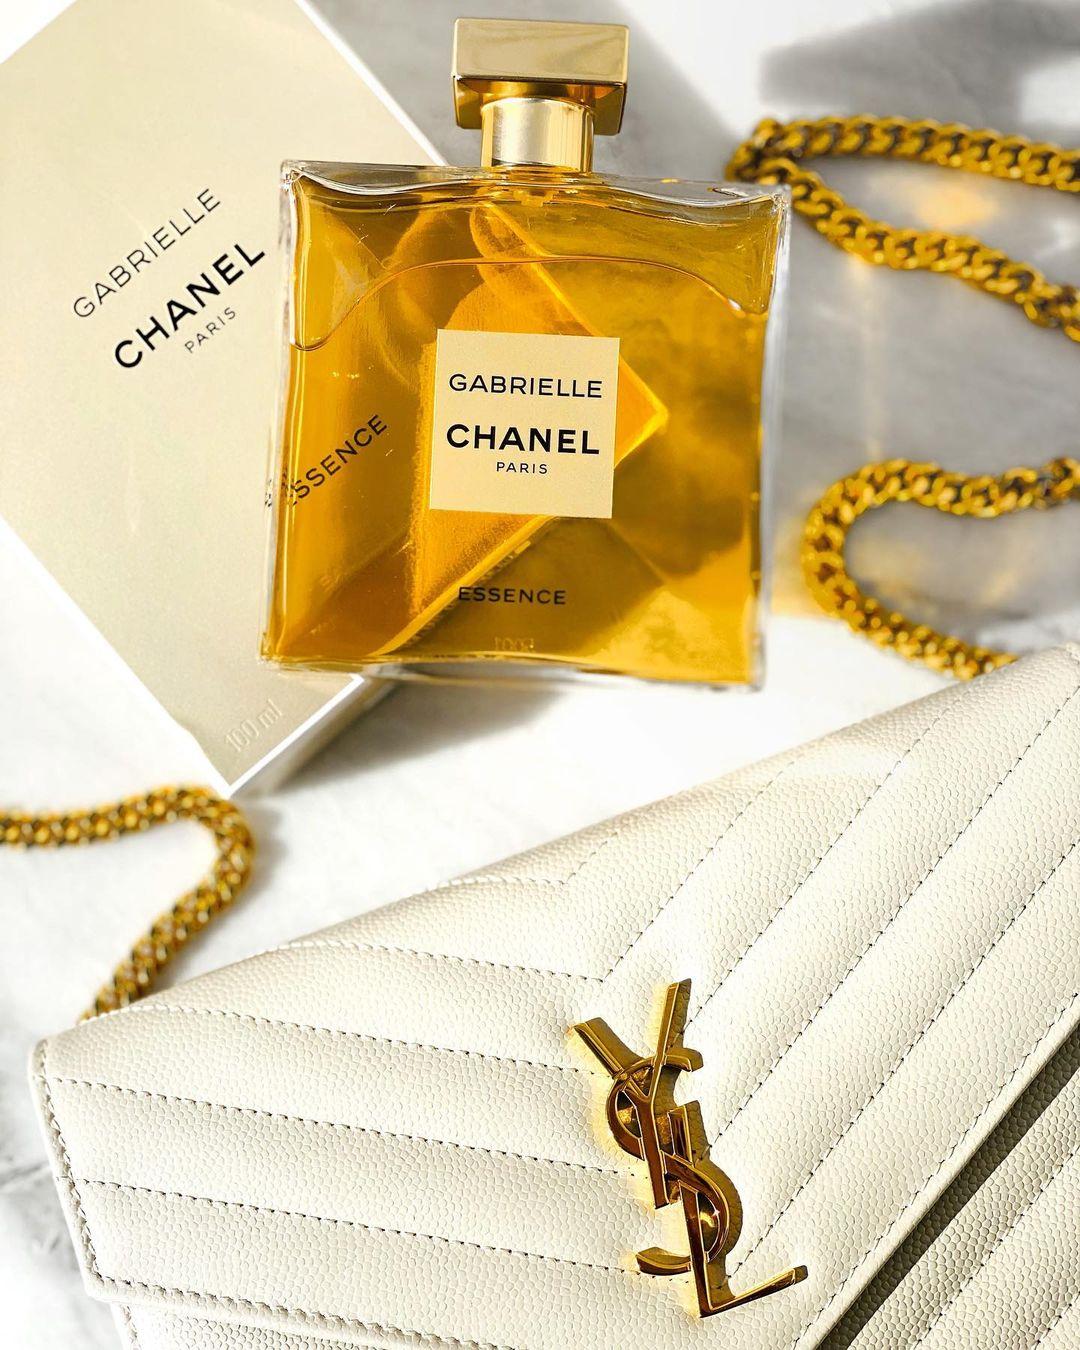 Chanel Gabrielle Essence EDP 150ml